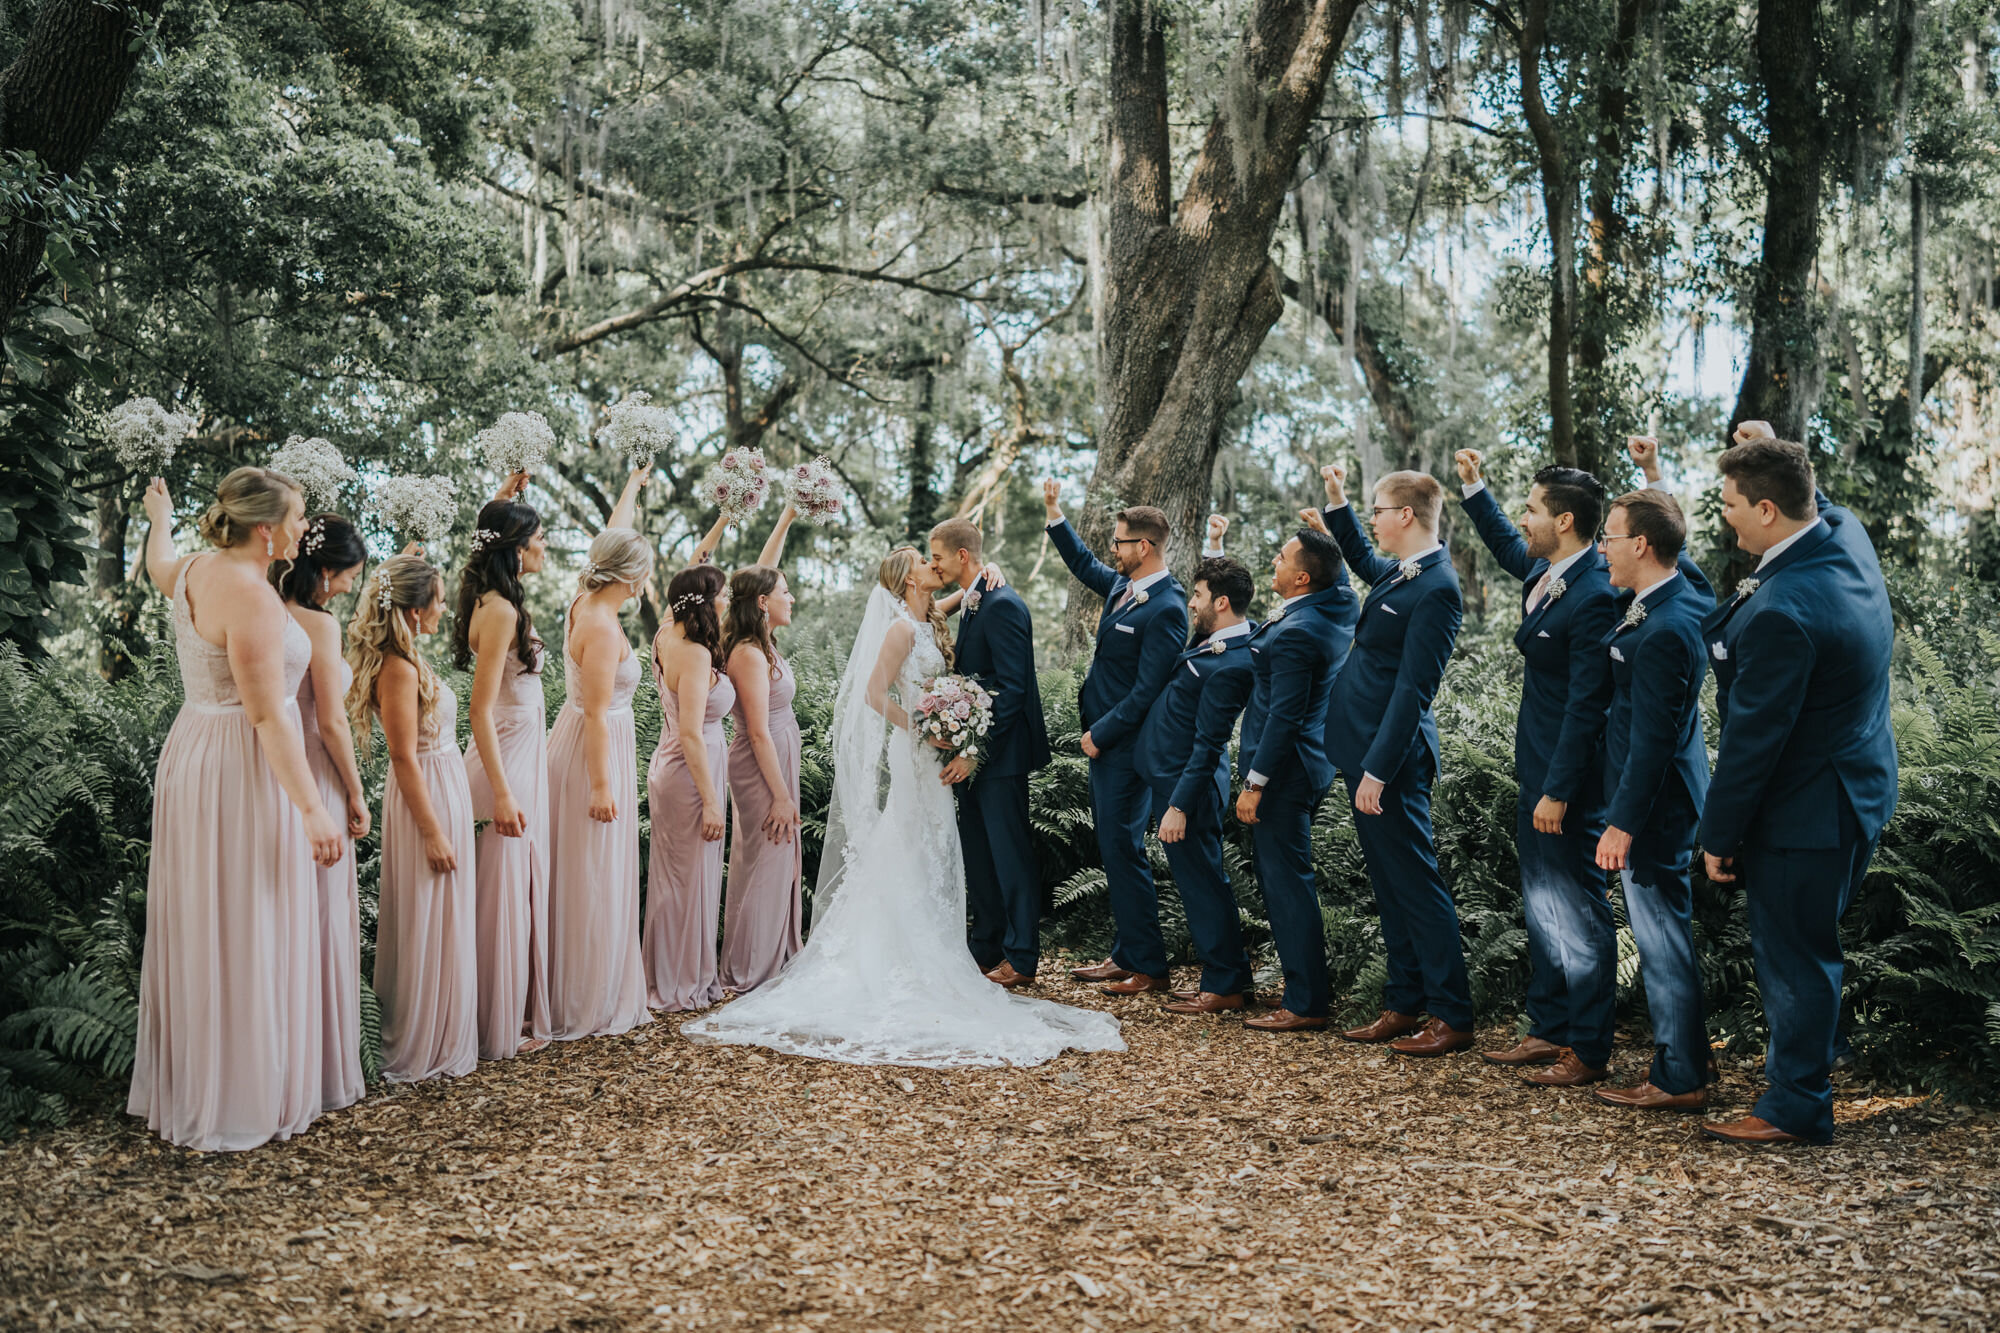 308Sean_Emily_Wedding_3-30-19.jpg